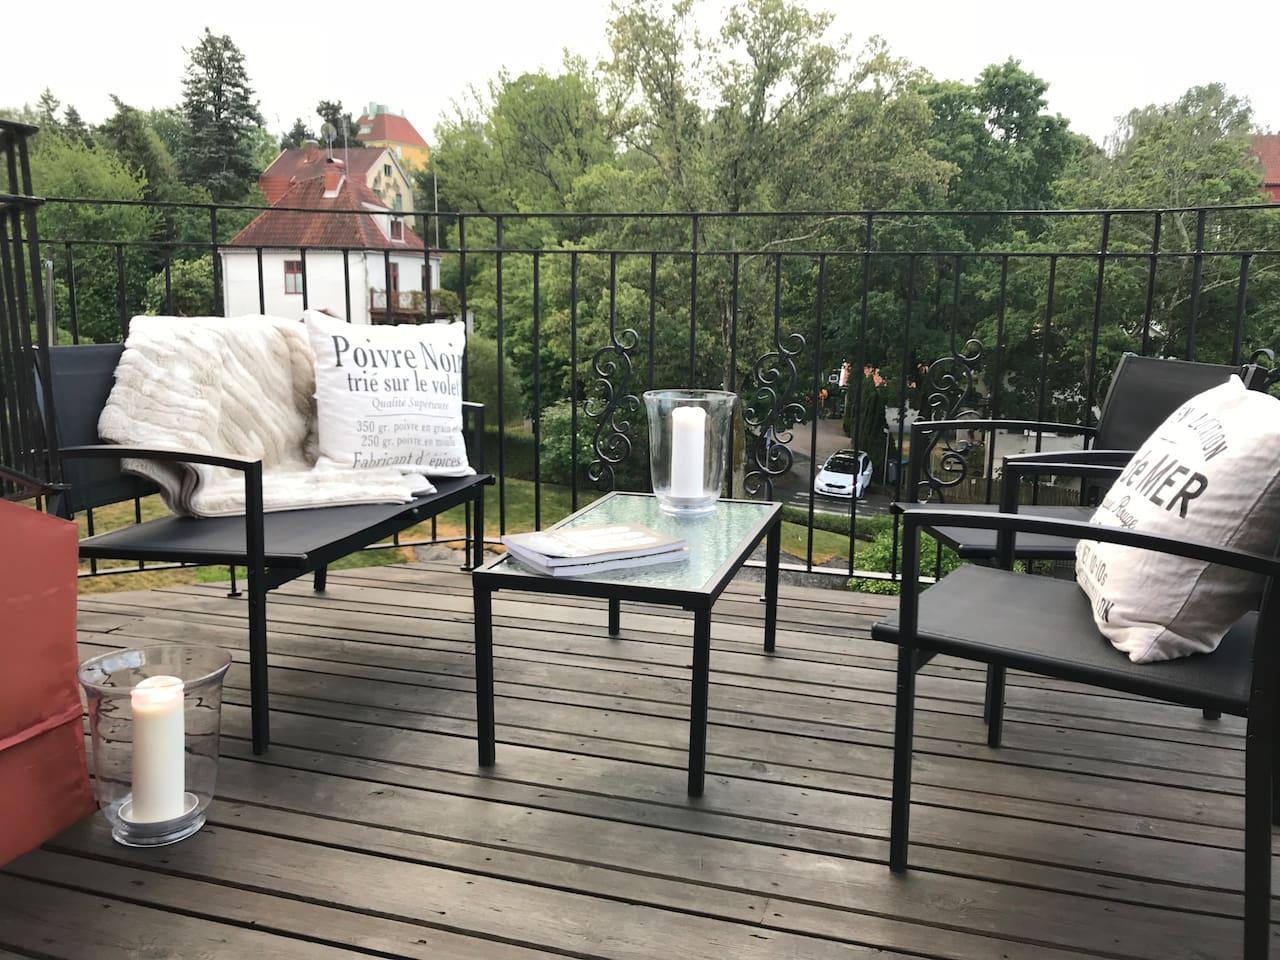 Lounge set on the rooftop balcony